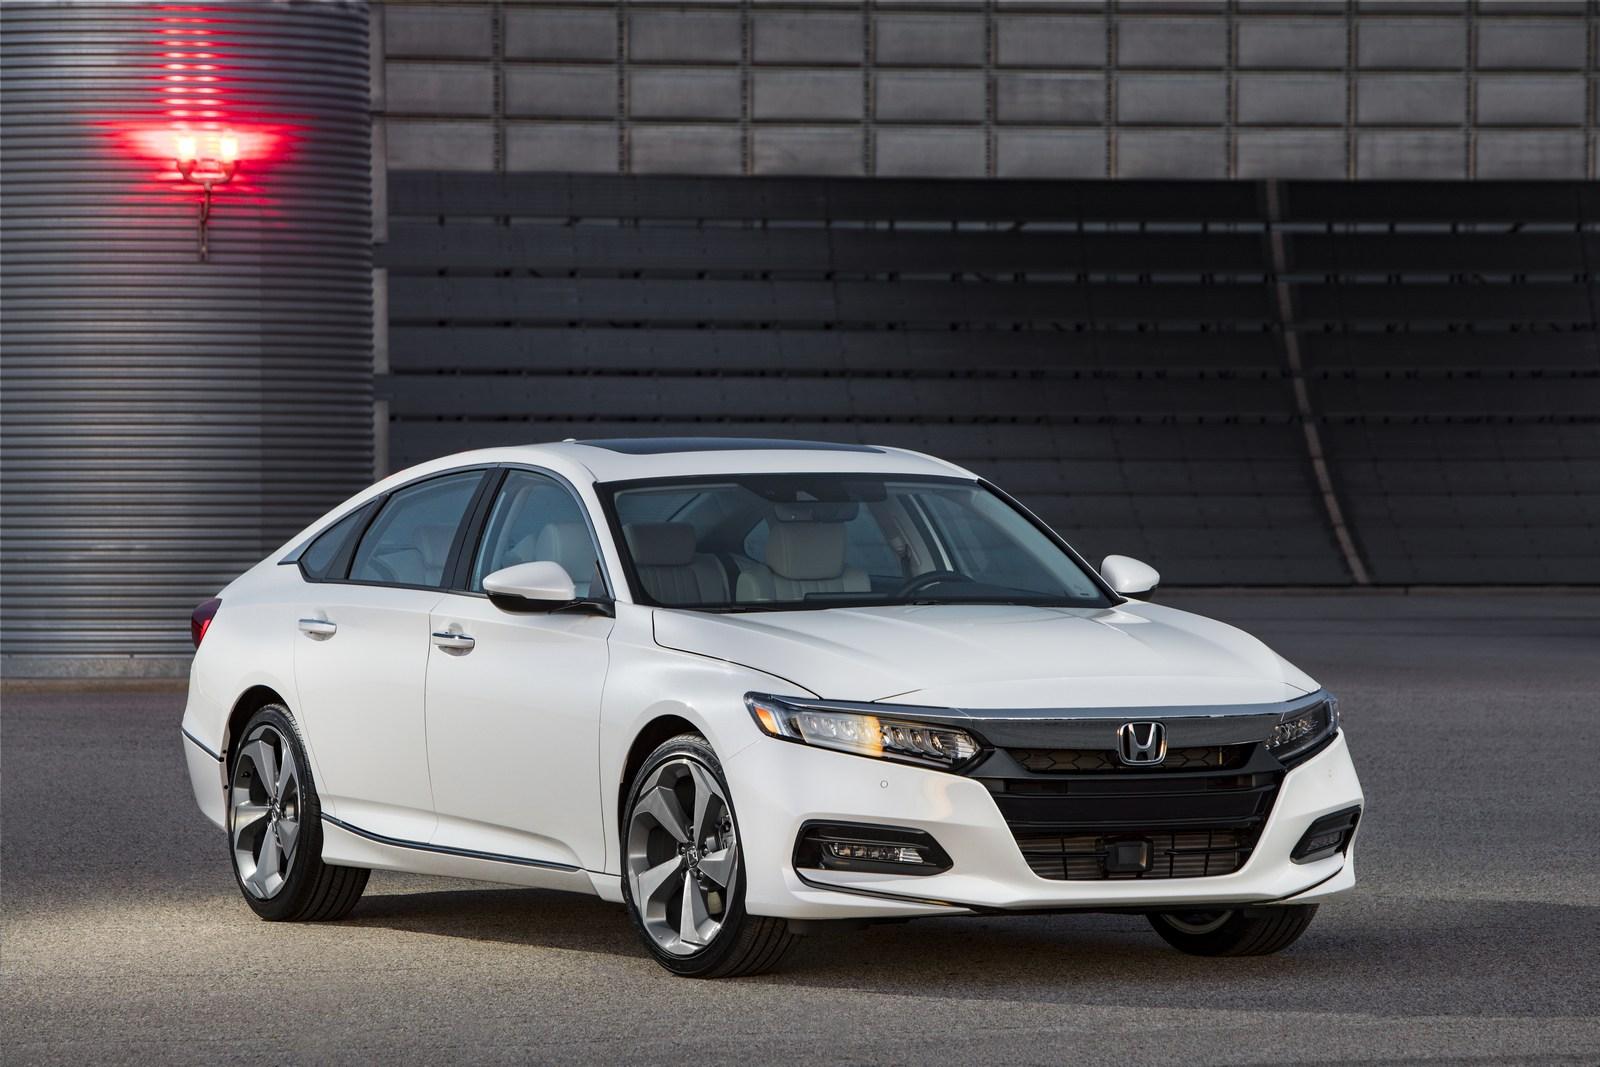 Kelebihan Toyota Accord Spesifikasi